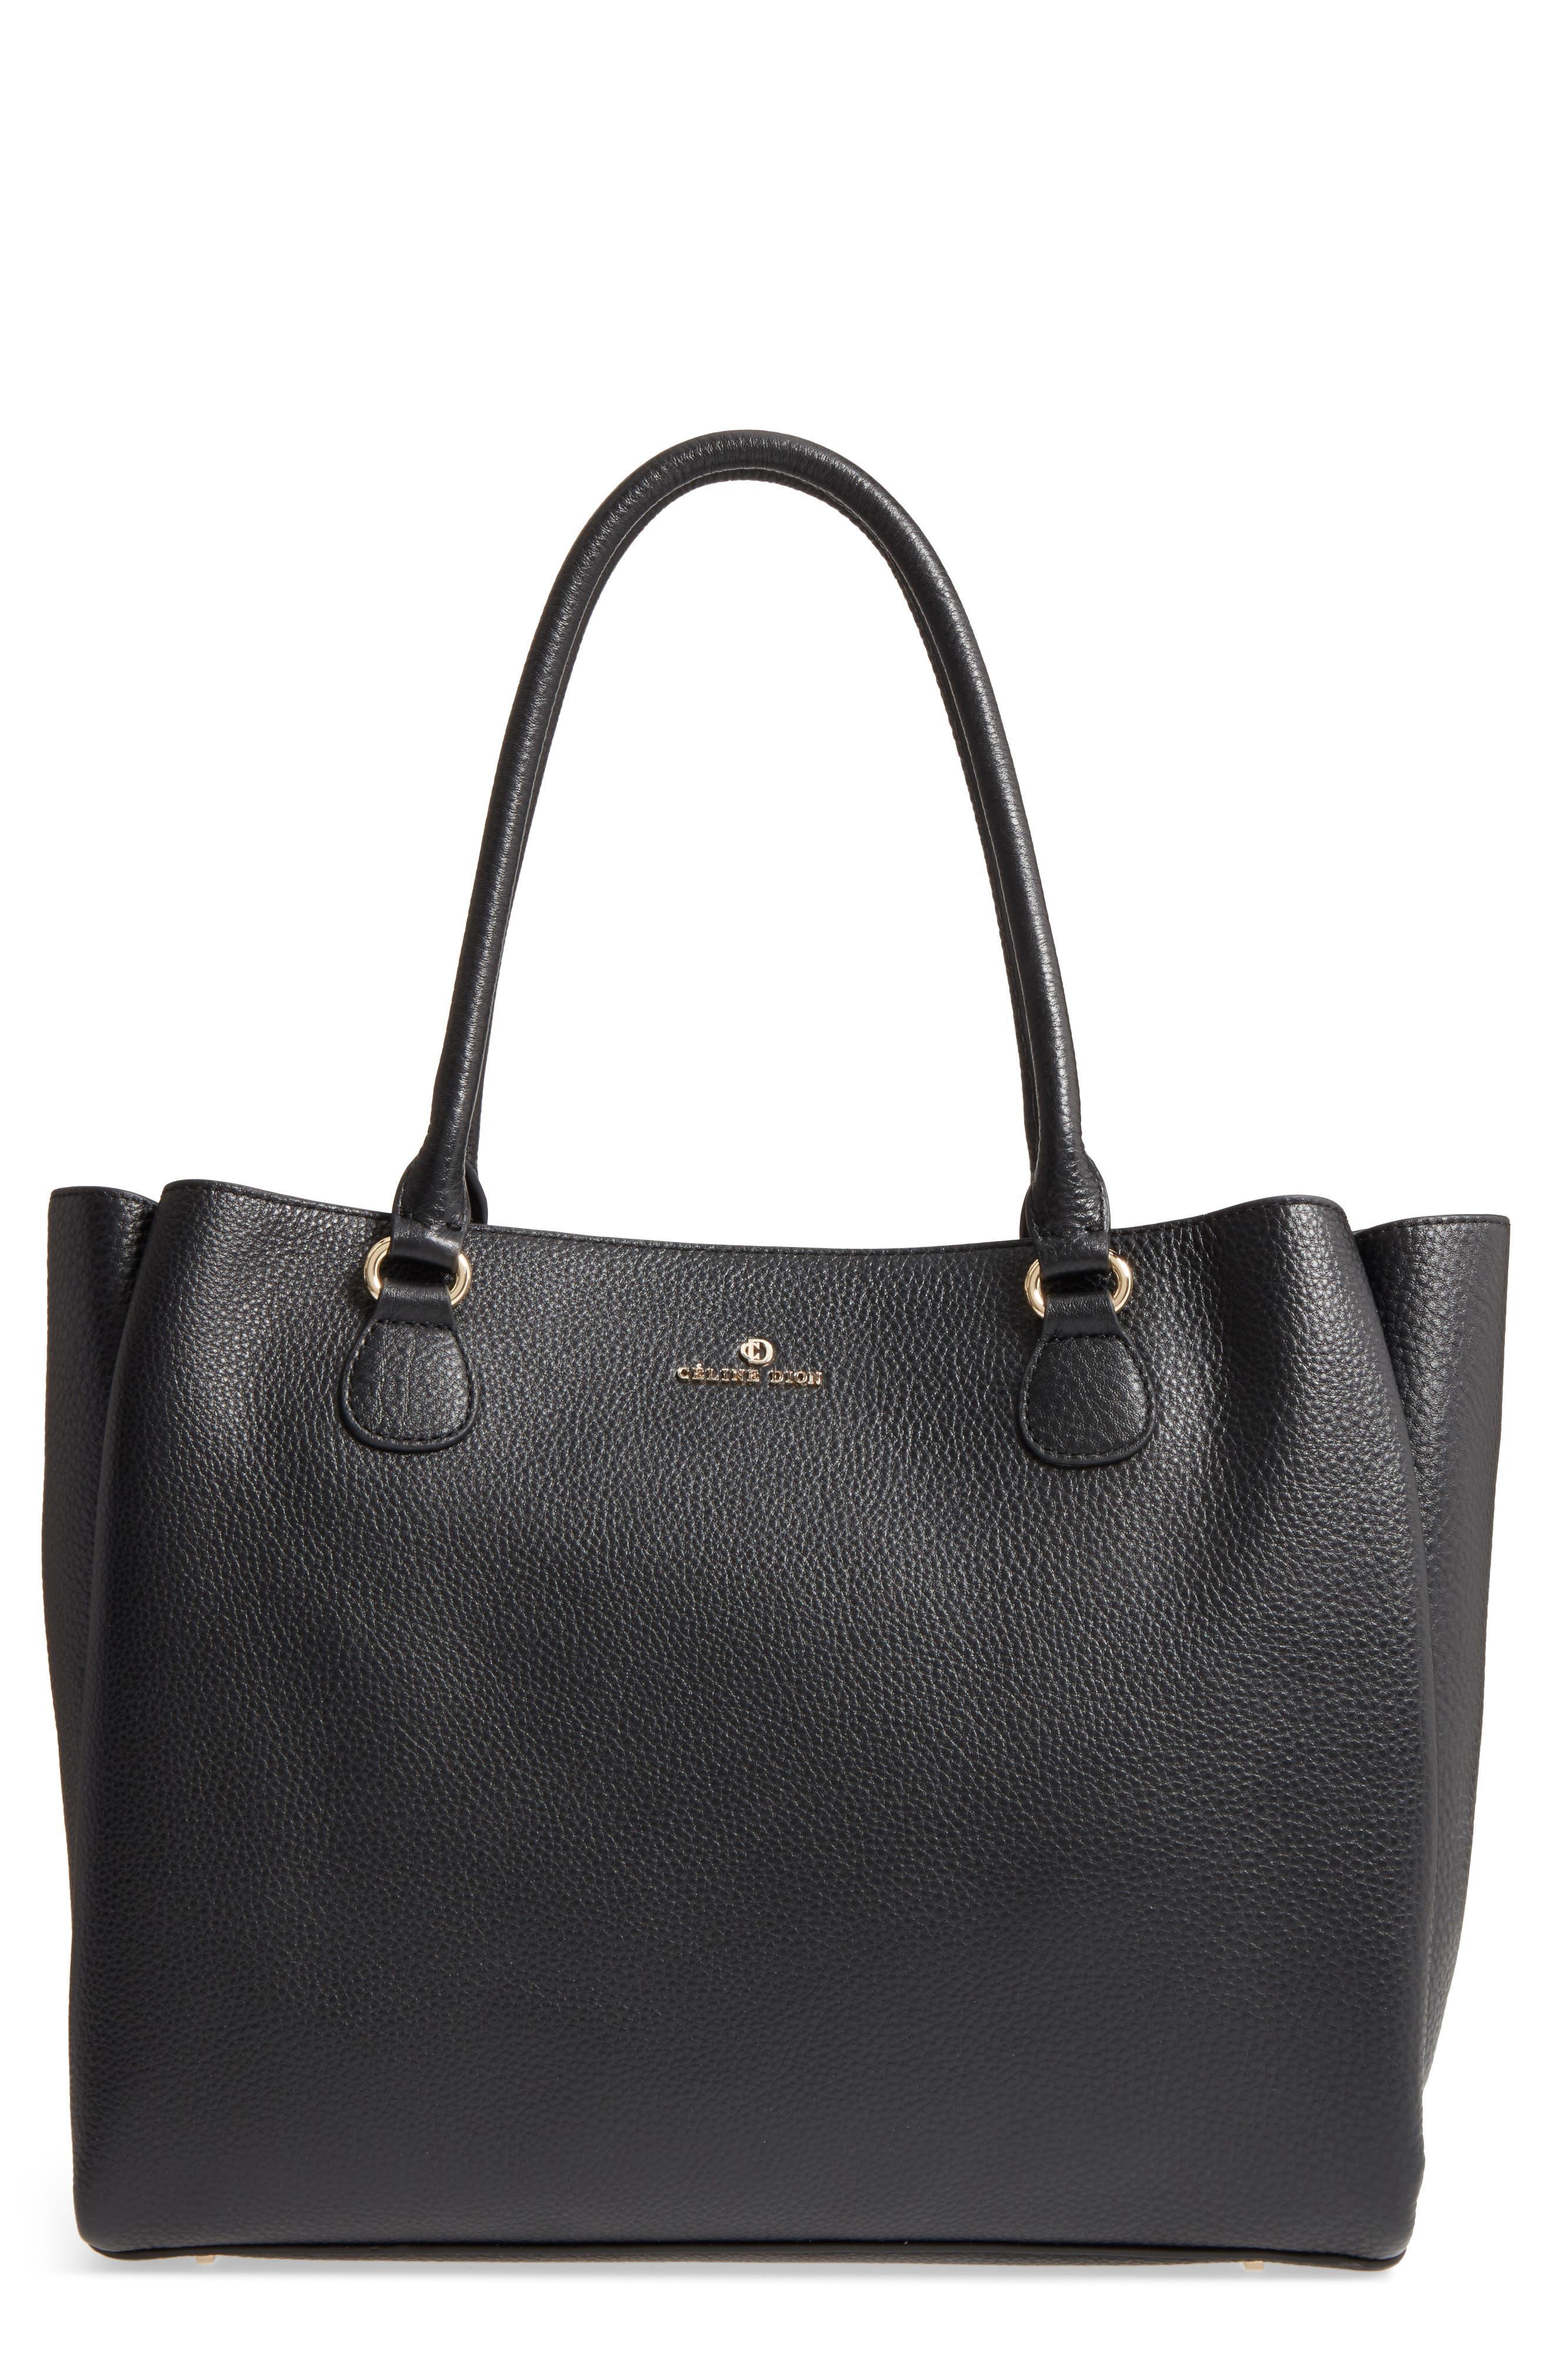 Céline Dion Adagio Leather Tote